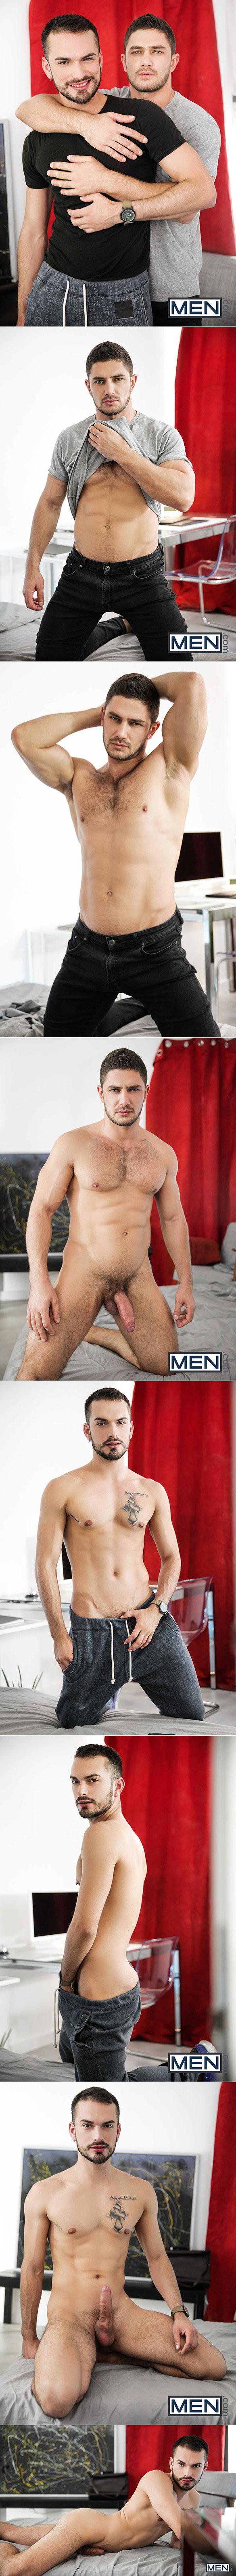 "Men.com: Dato Foland fucks Jean Favre in ""Made You Look, Part 3"""